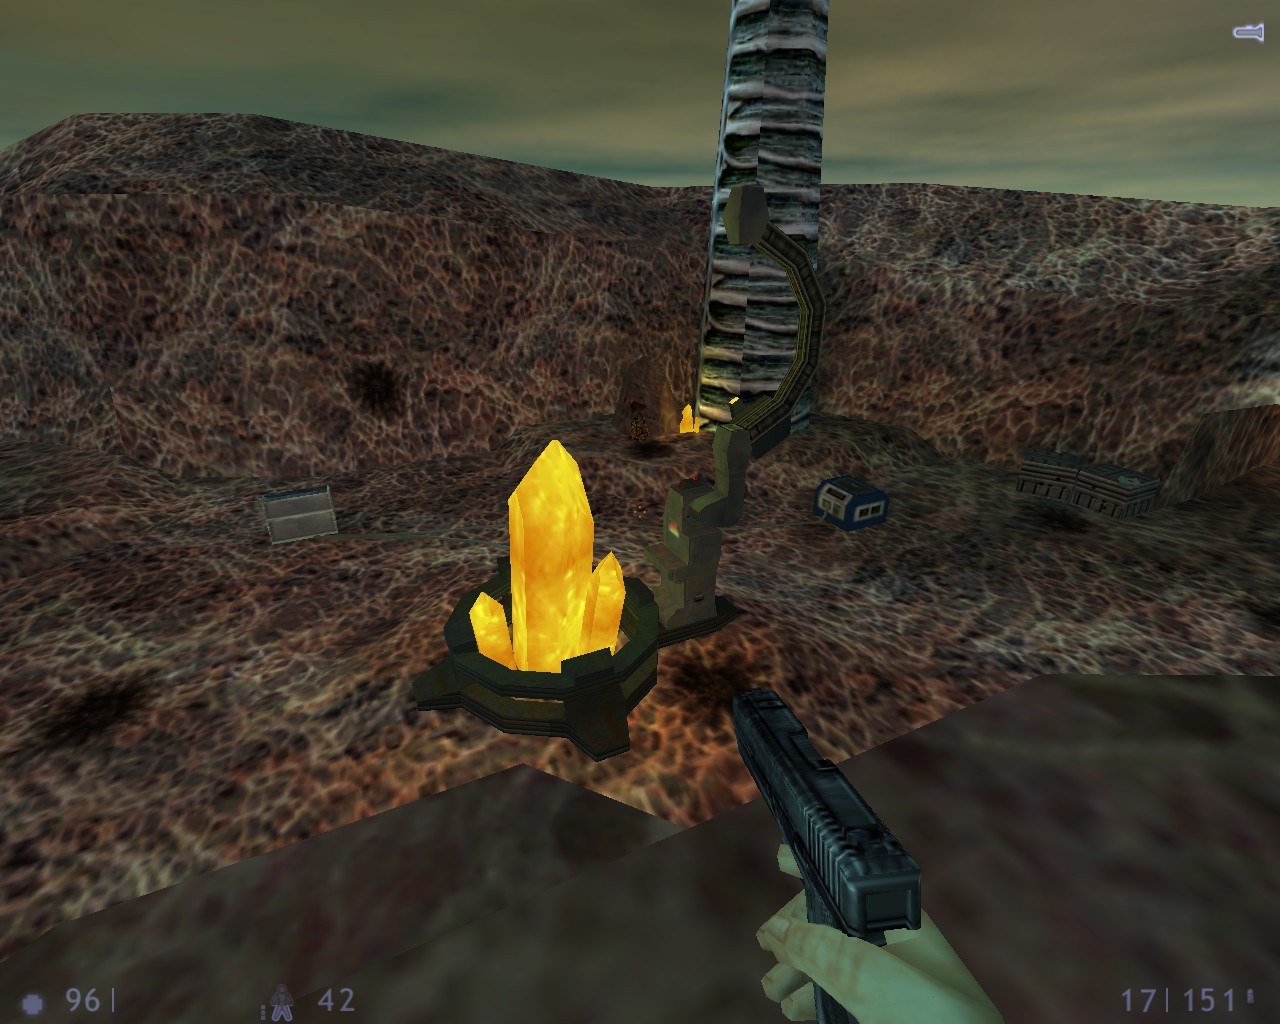 hl 2014-01-01 18-59-34-36.jpg - Half-Life